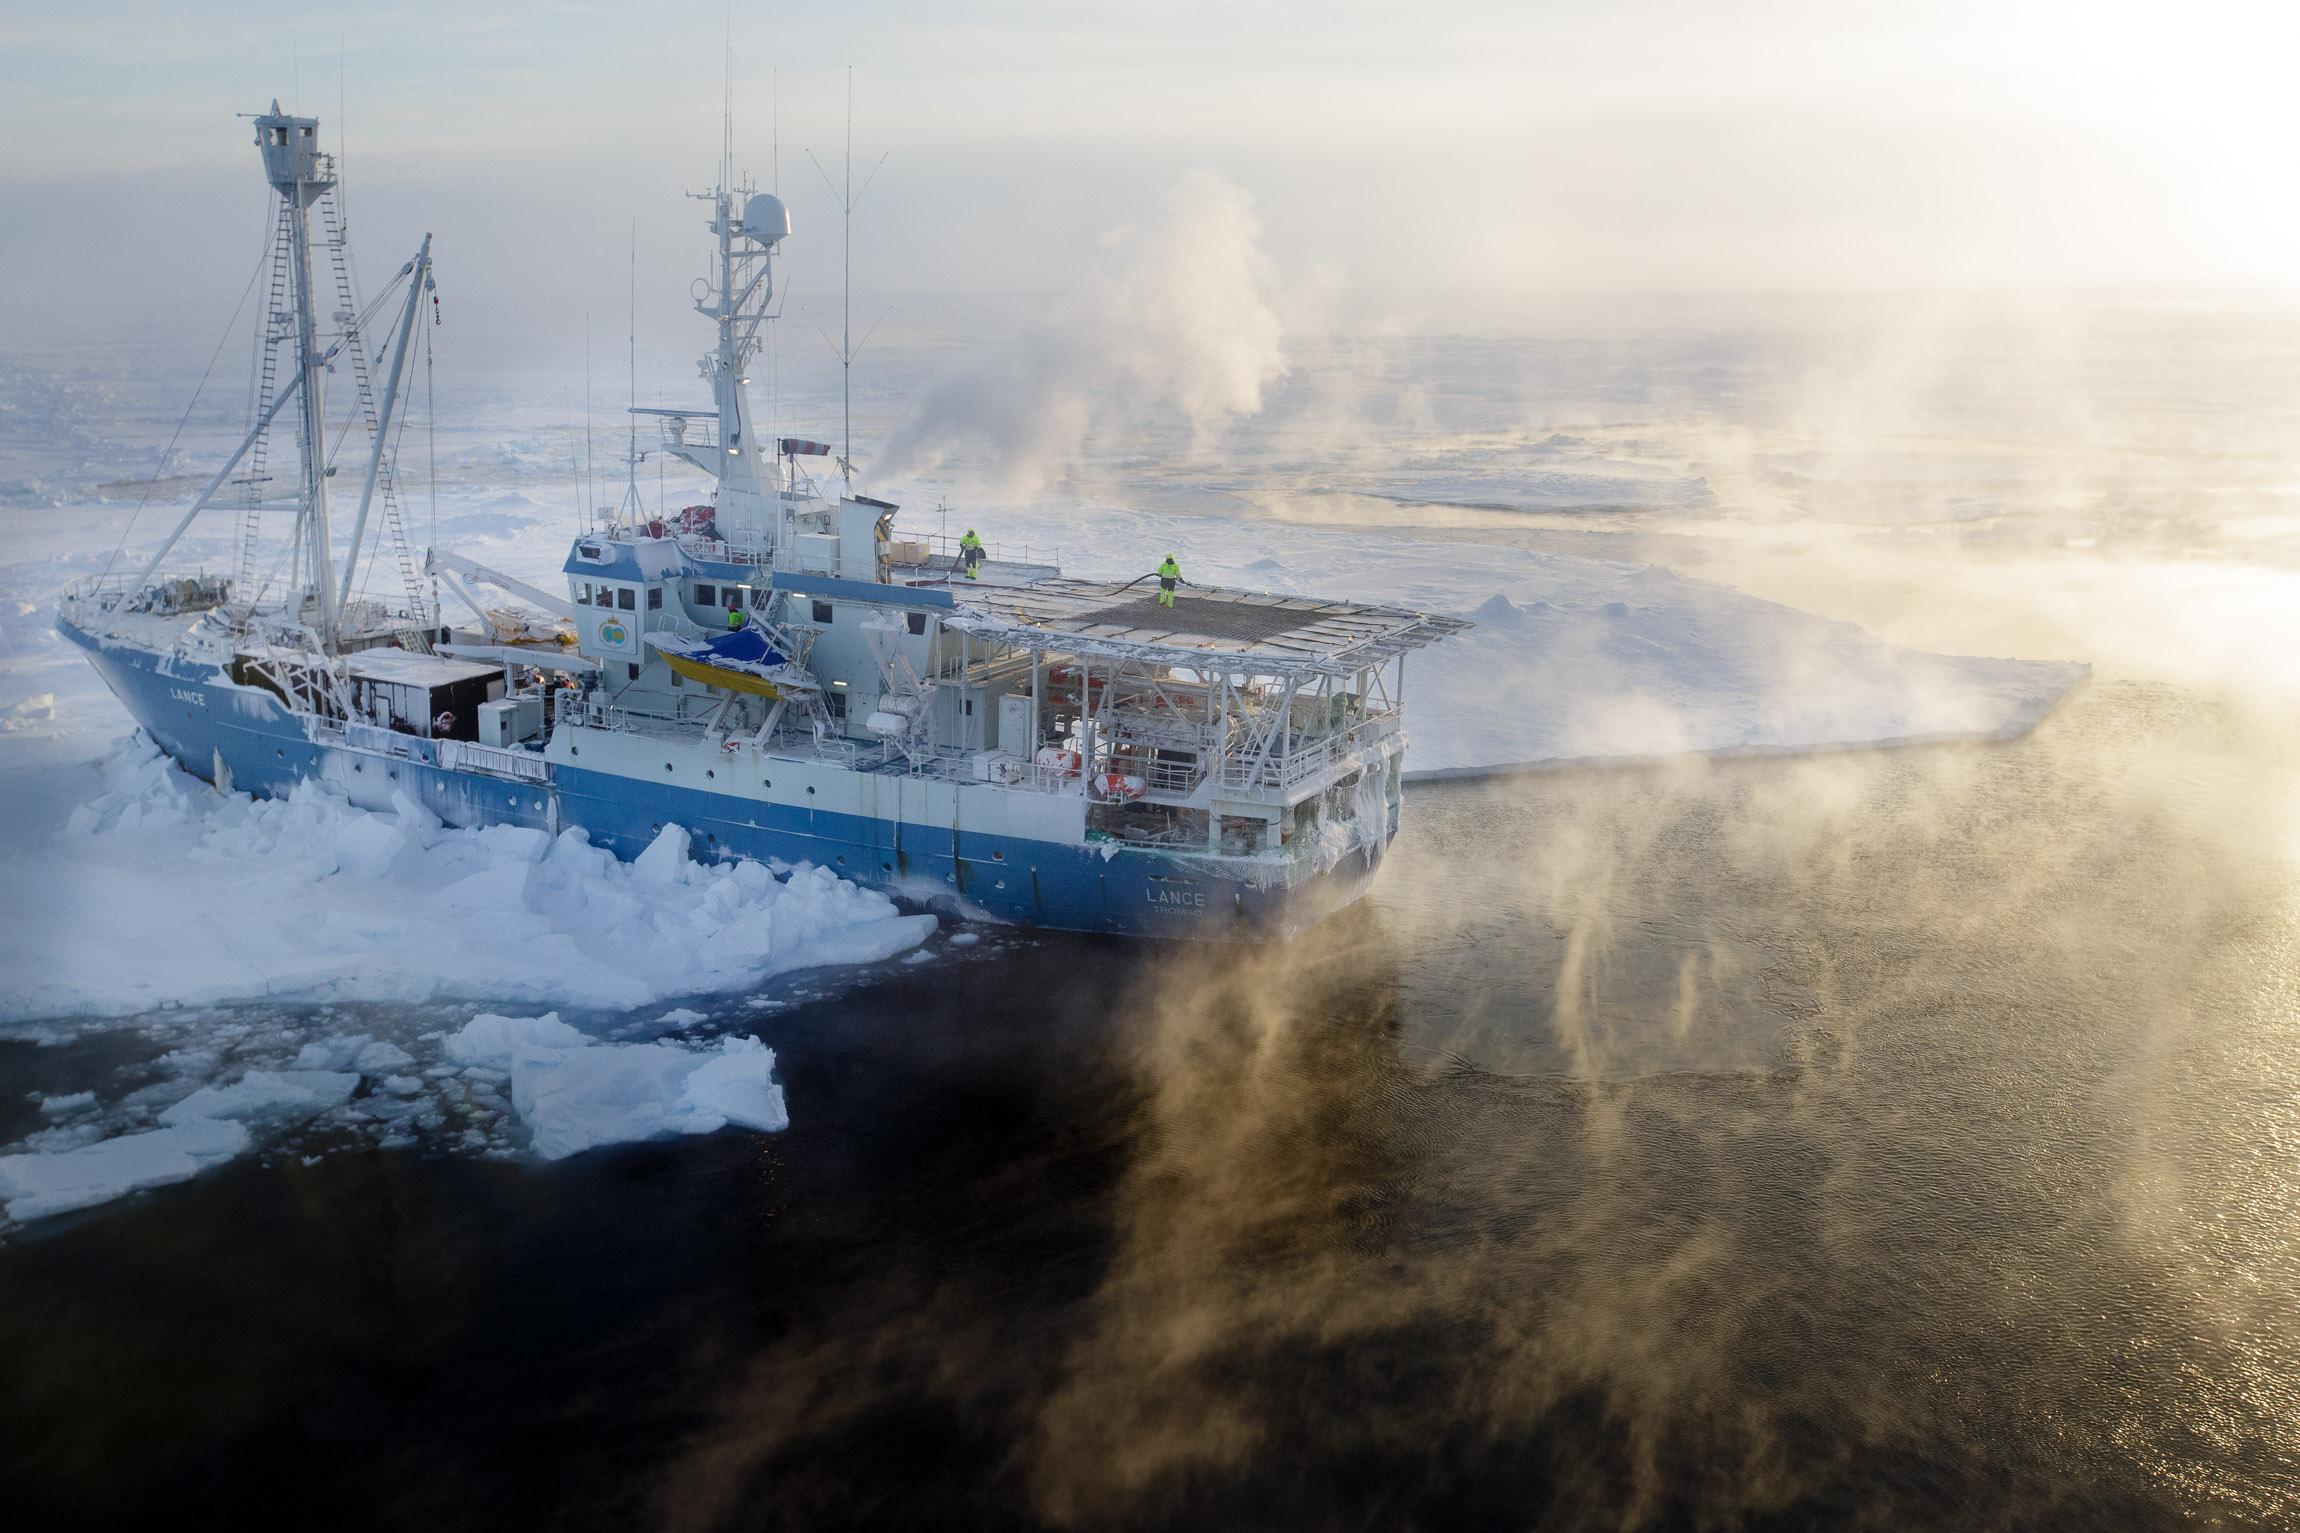 Lance stuck in sea ice